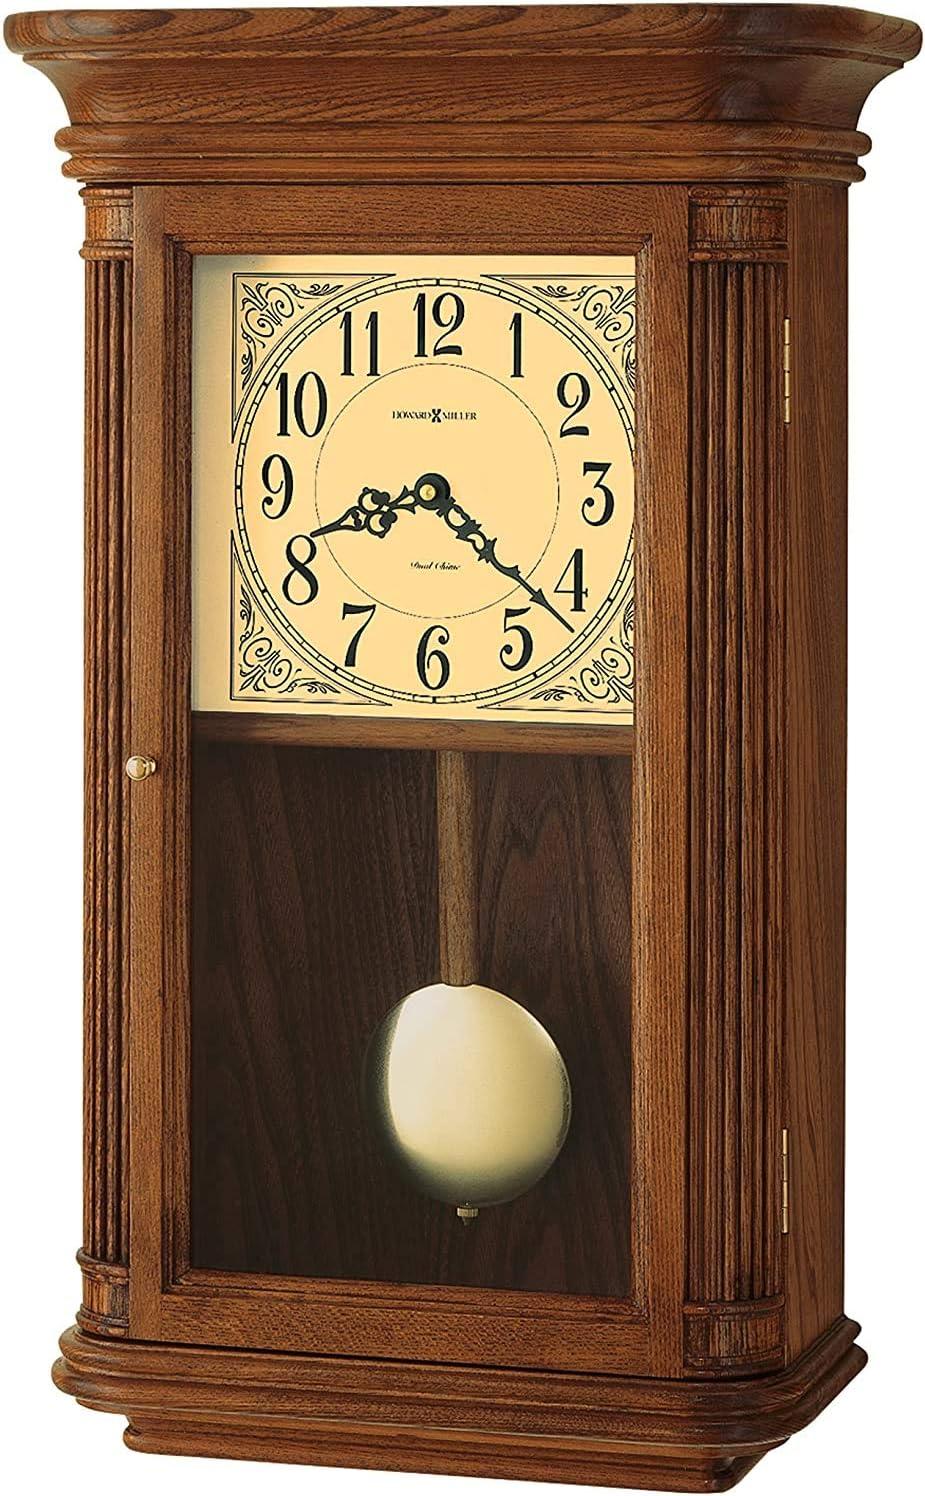 Howard Miller Westbrook Wall Clock 625-281 – Oak Yorkshire Home Decor with Wood Pendulum, Brass Bob with Quartz, Dual-Chime Movement